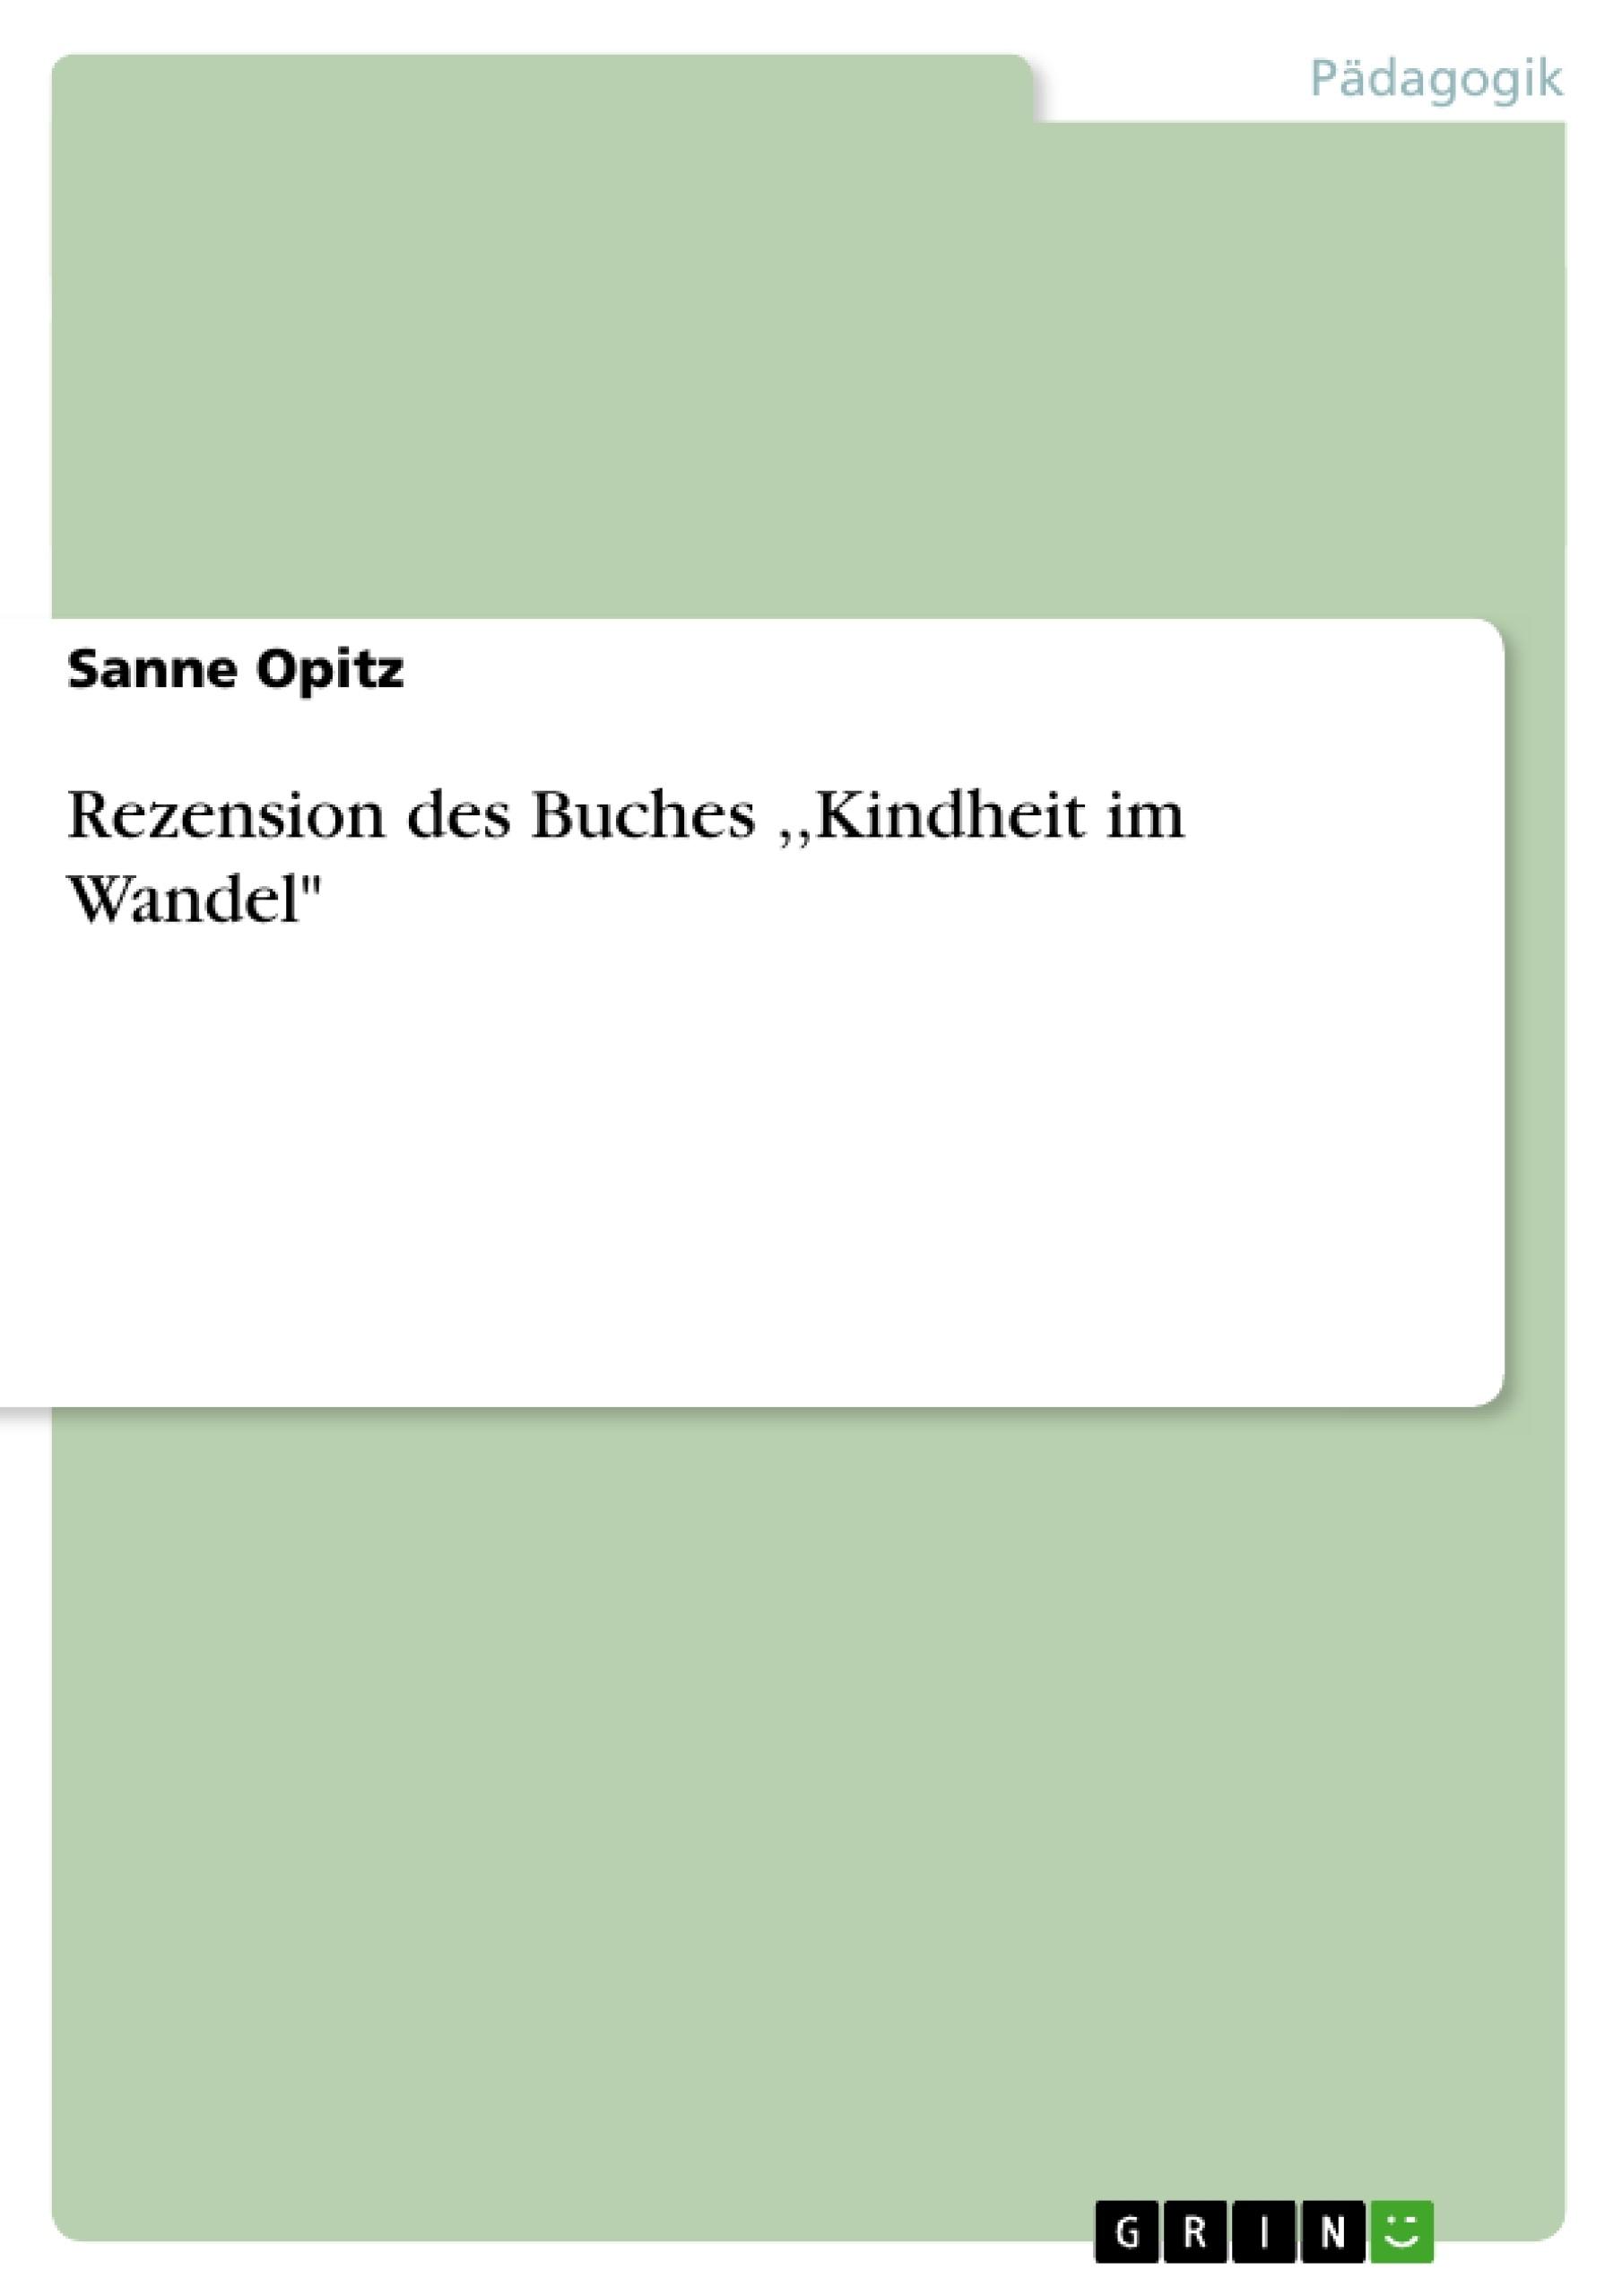 "Titel: Rezension des Buches ,,Kindheit im Wandel"""